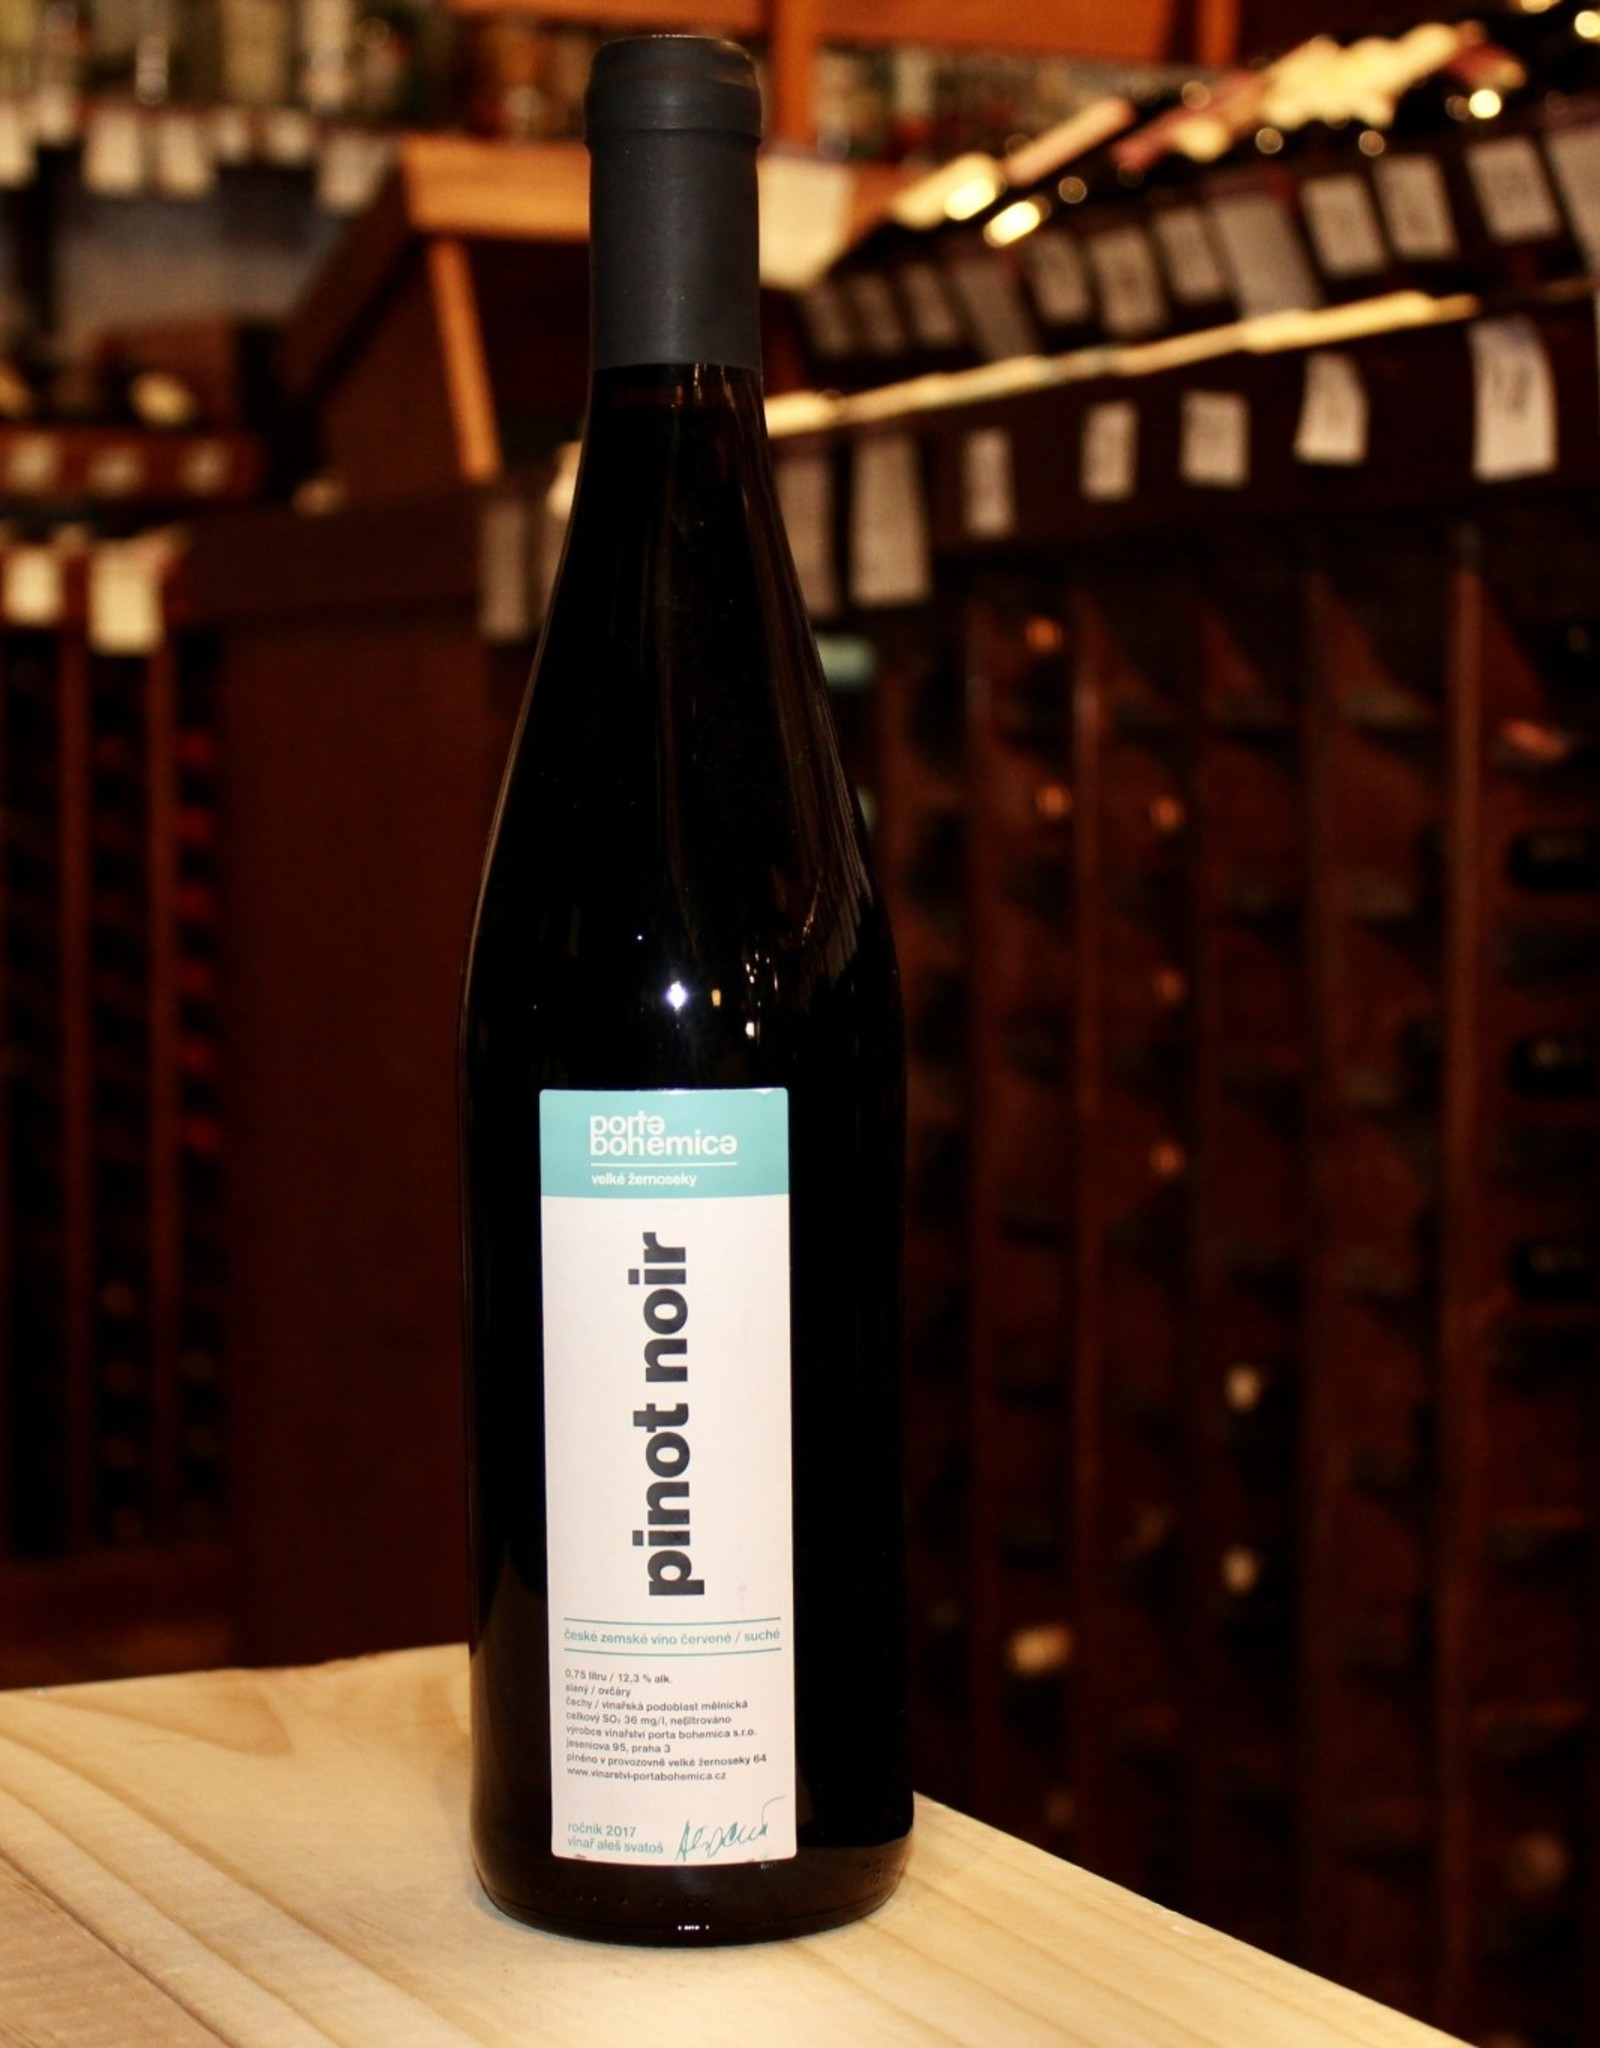 Wine 2017 Porta Bohemica Pinot Noir - Czech Republic (750ml)